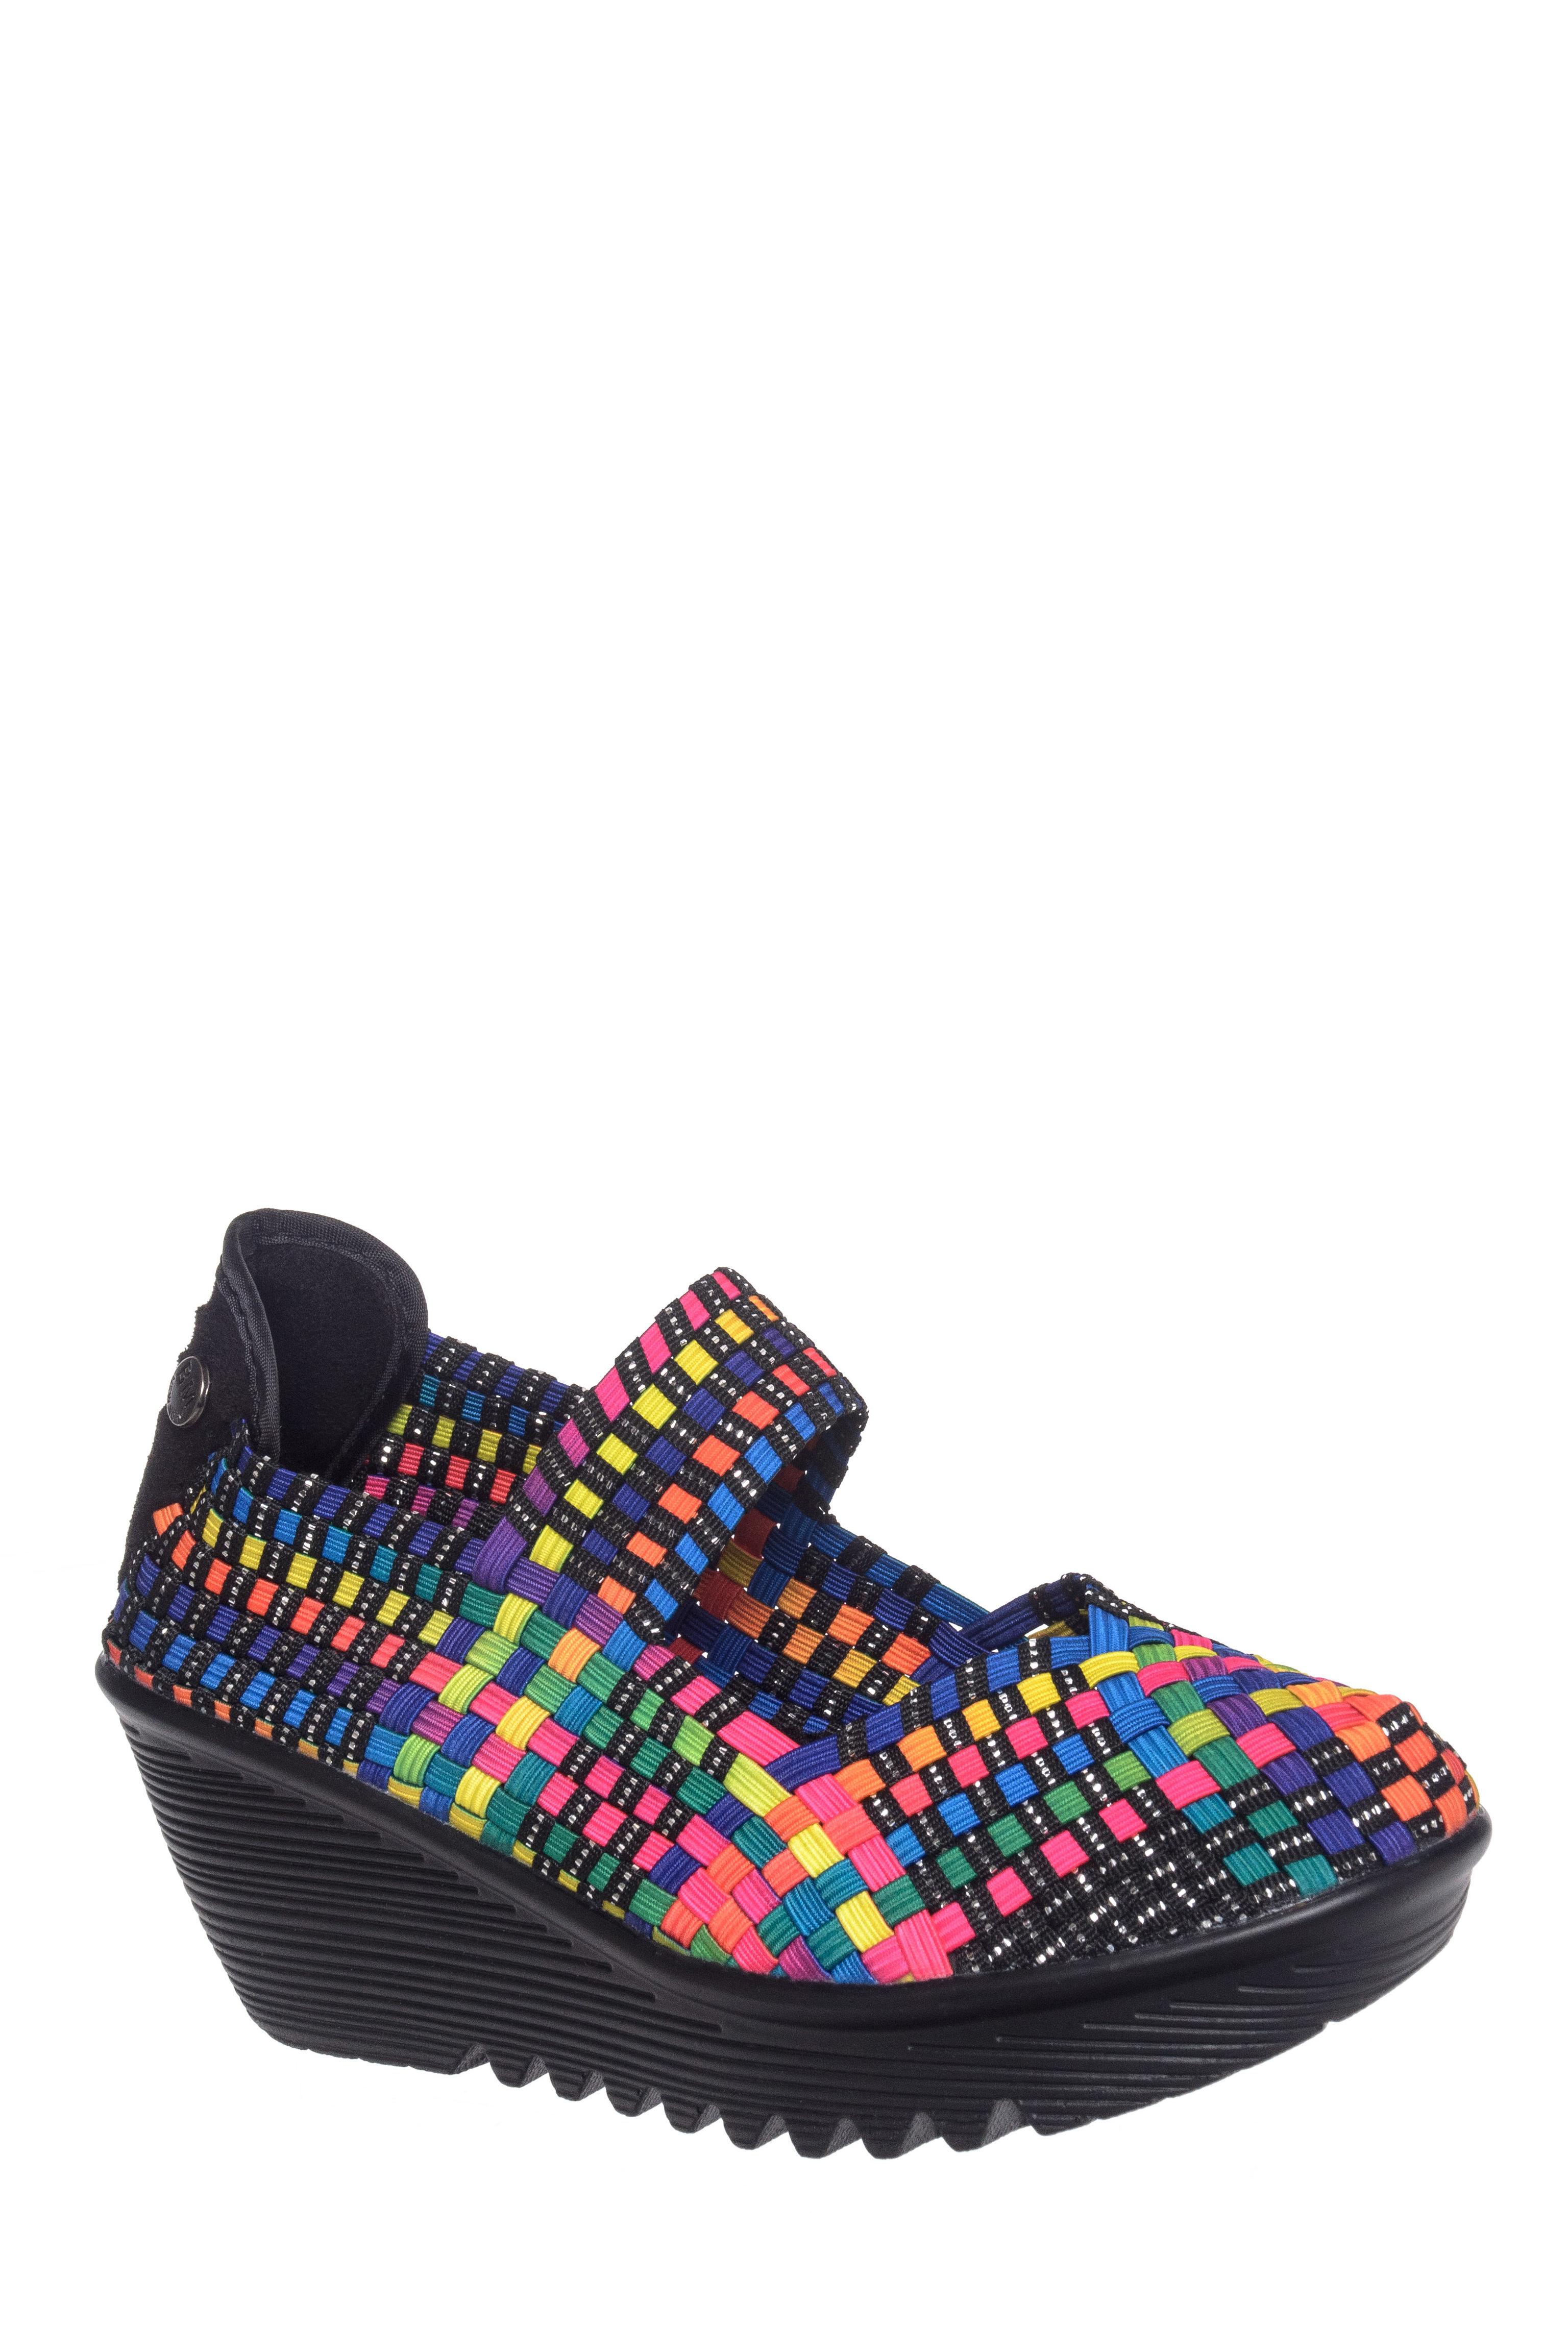 BERNIE MEV Lulia Mid Wedge Heels - Multicolor Black